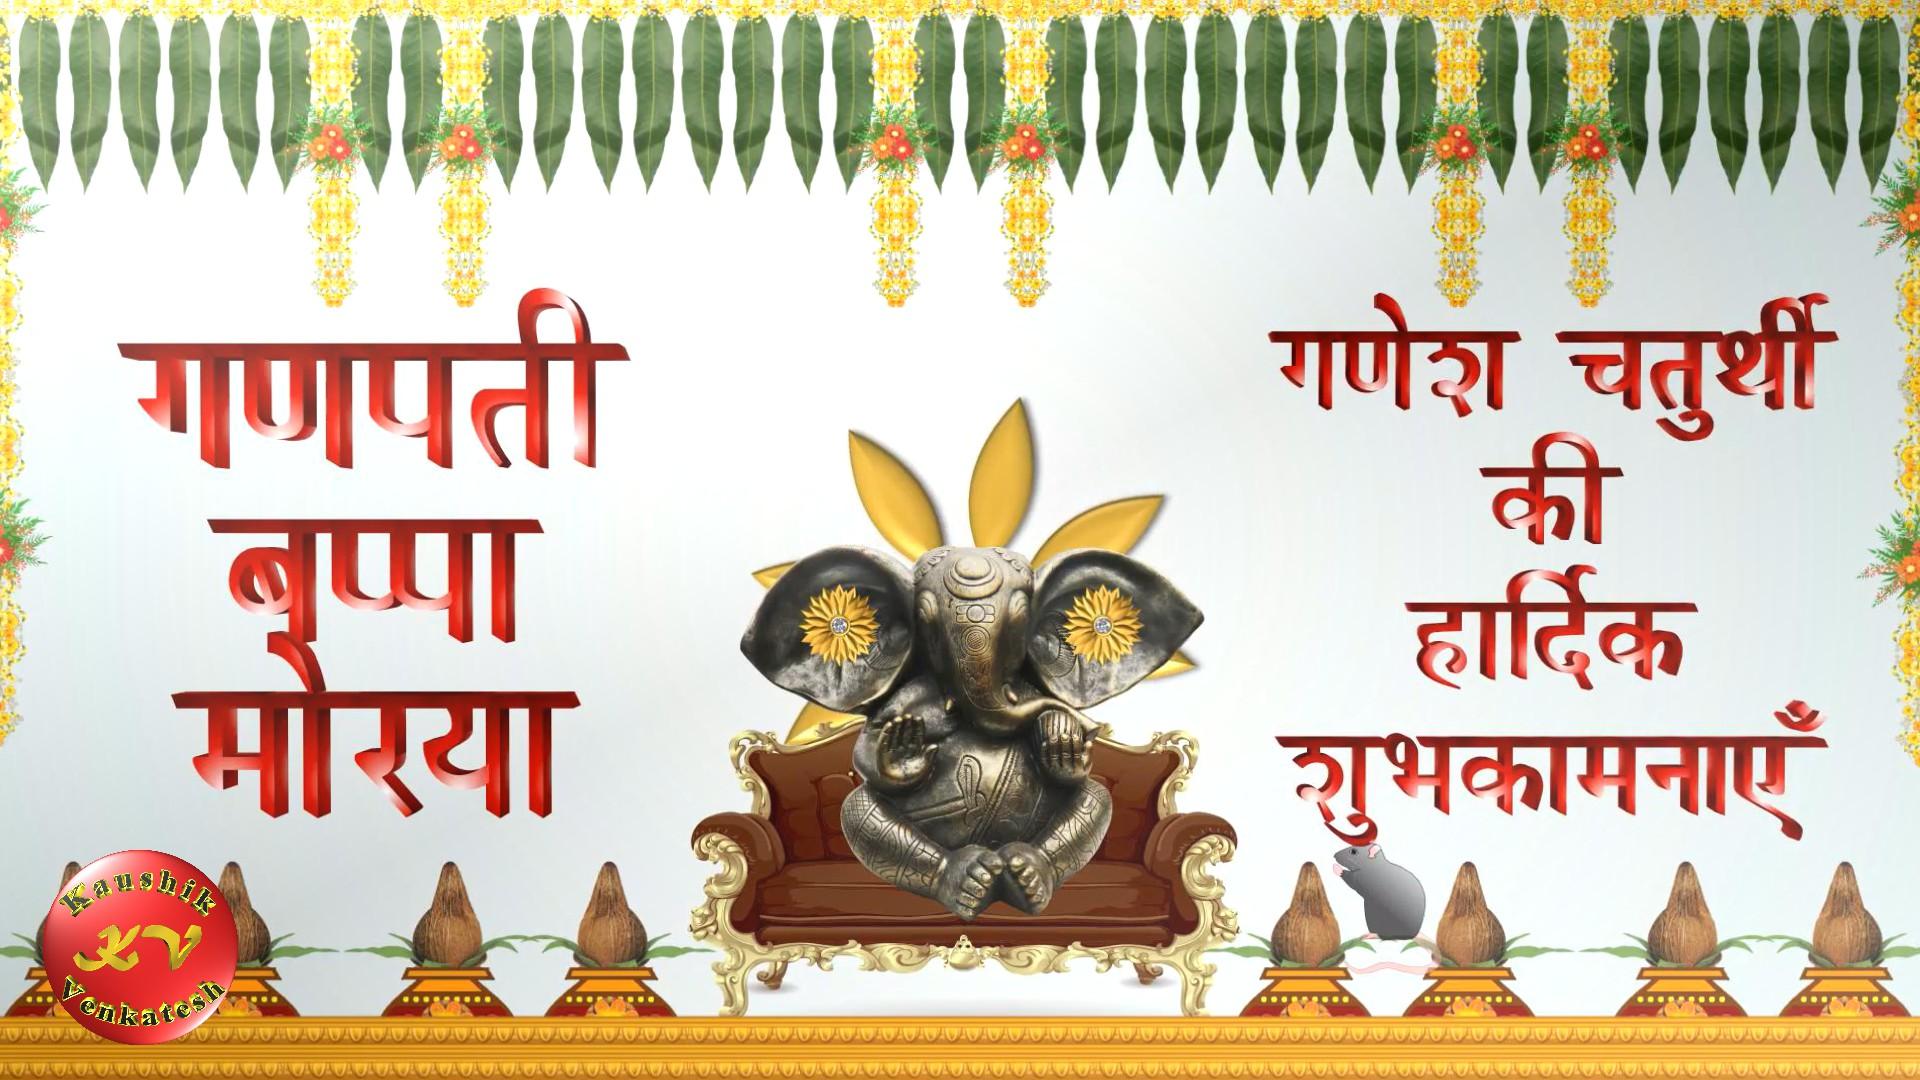 Greetings for Ganesh Chaturthi (Hindi Font)